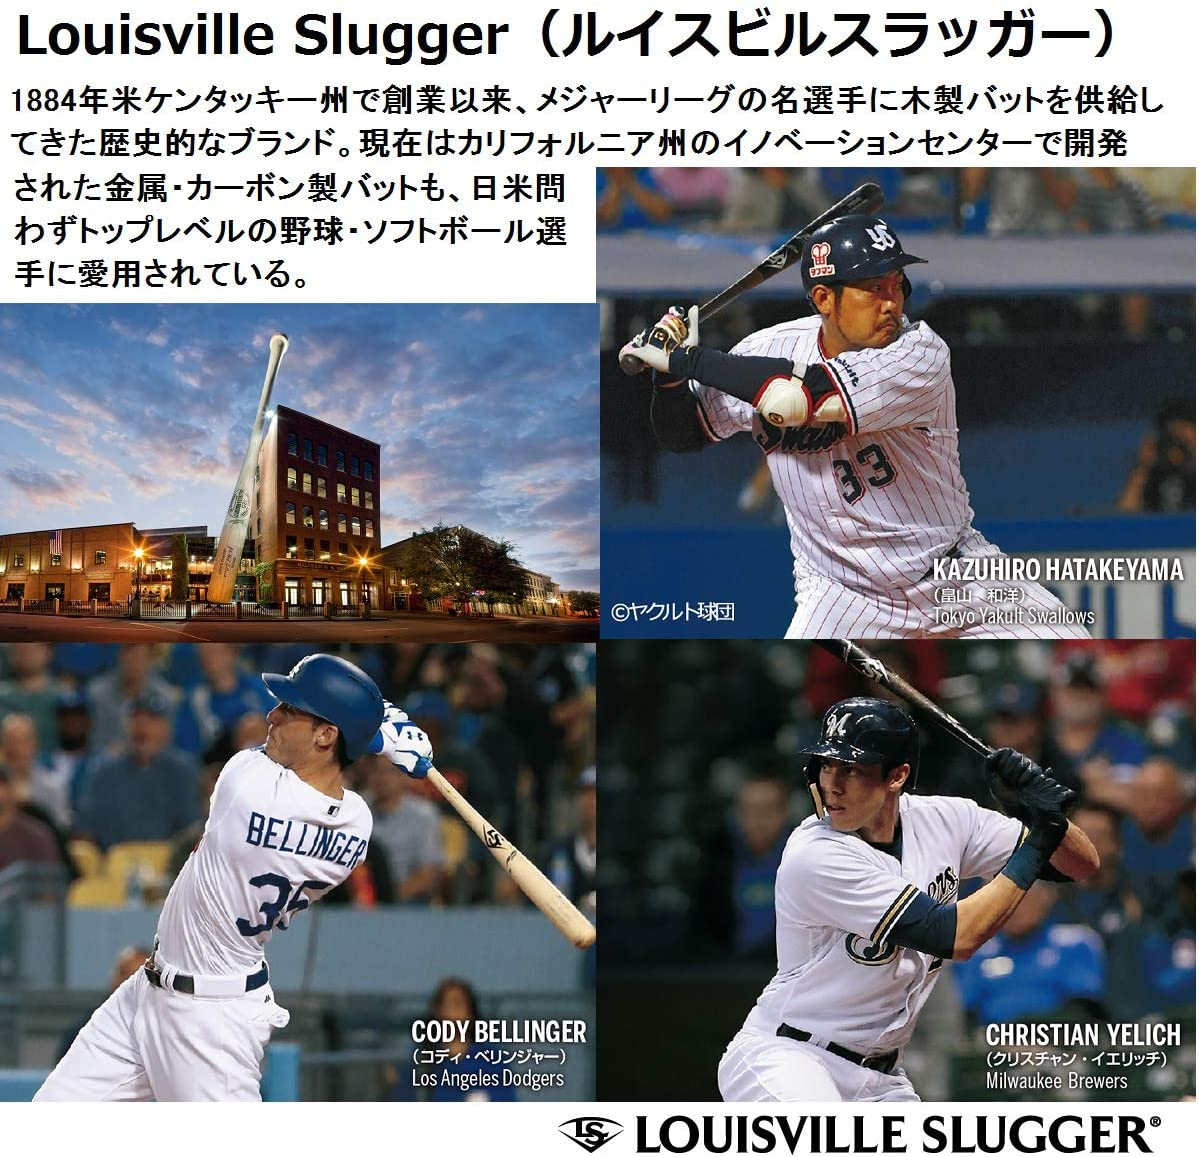 Louisville Slugger Hats - Snapback, Flexfit and Classic